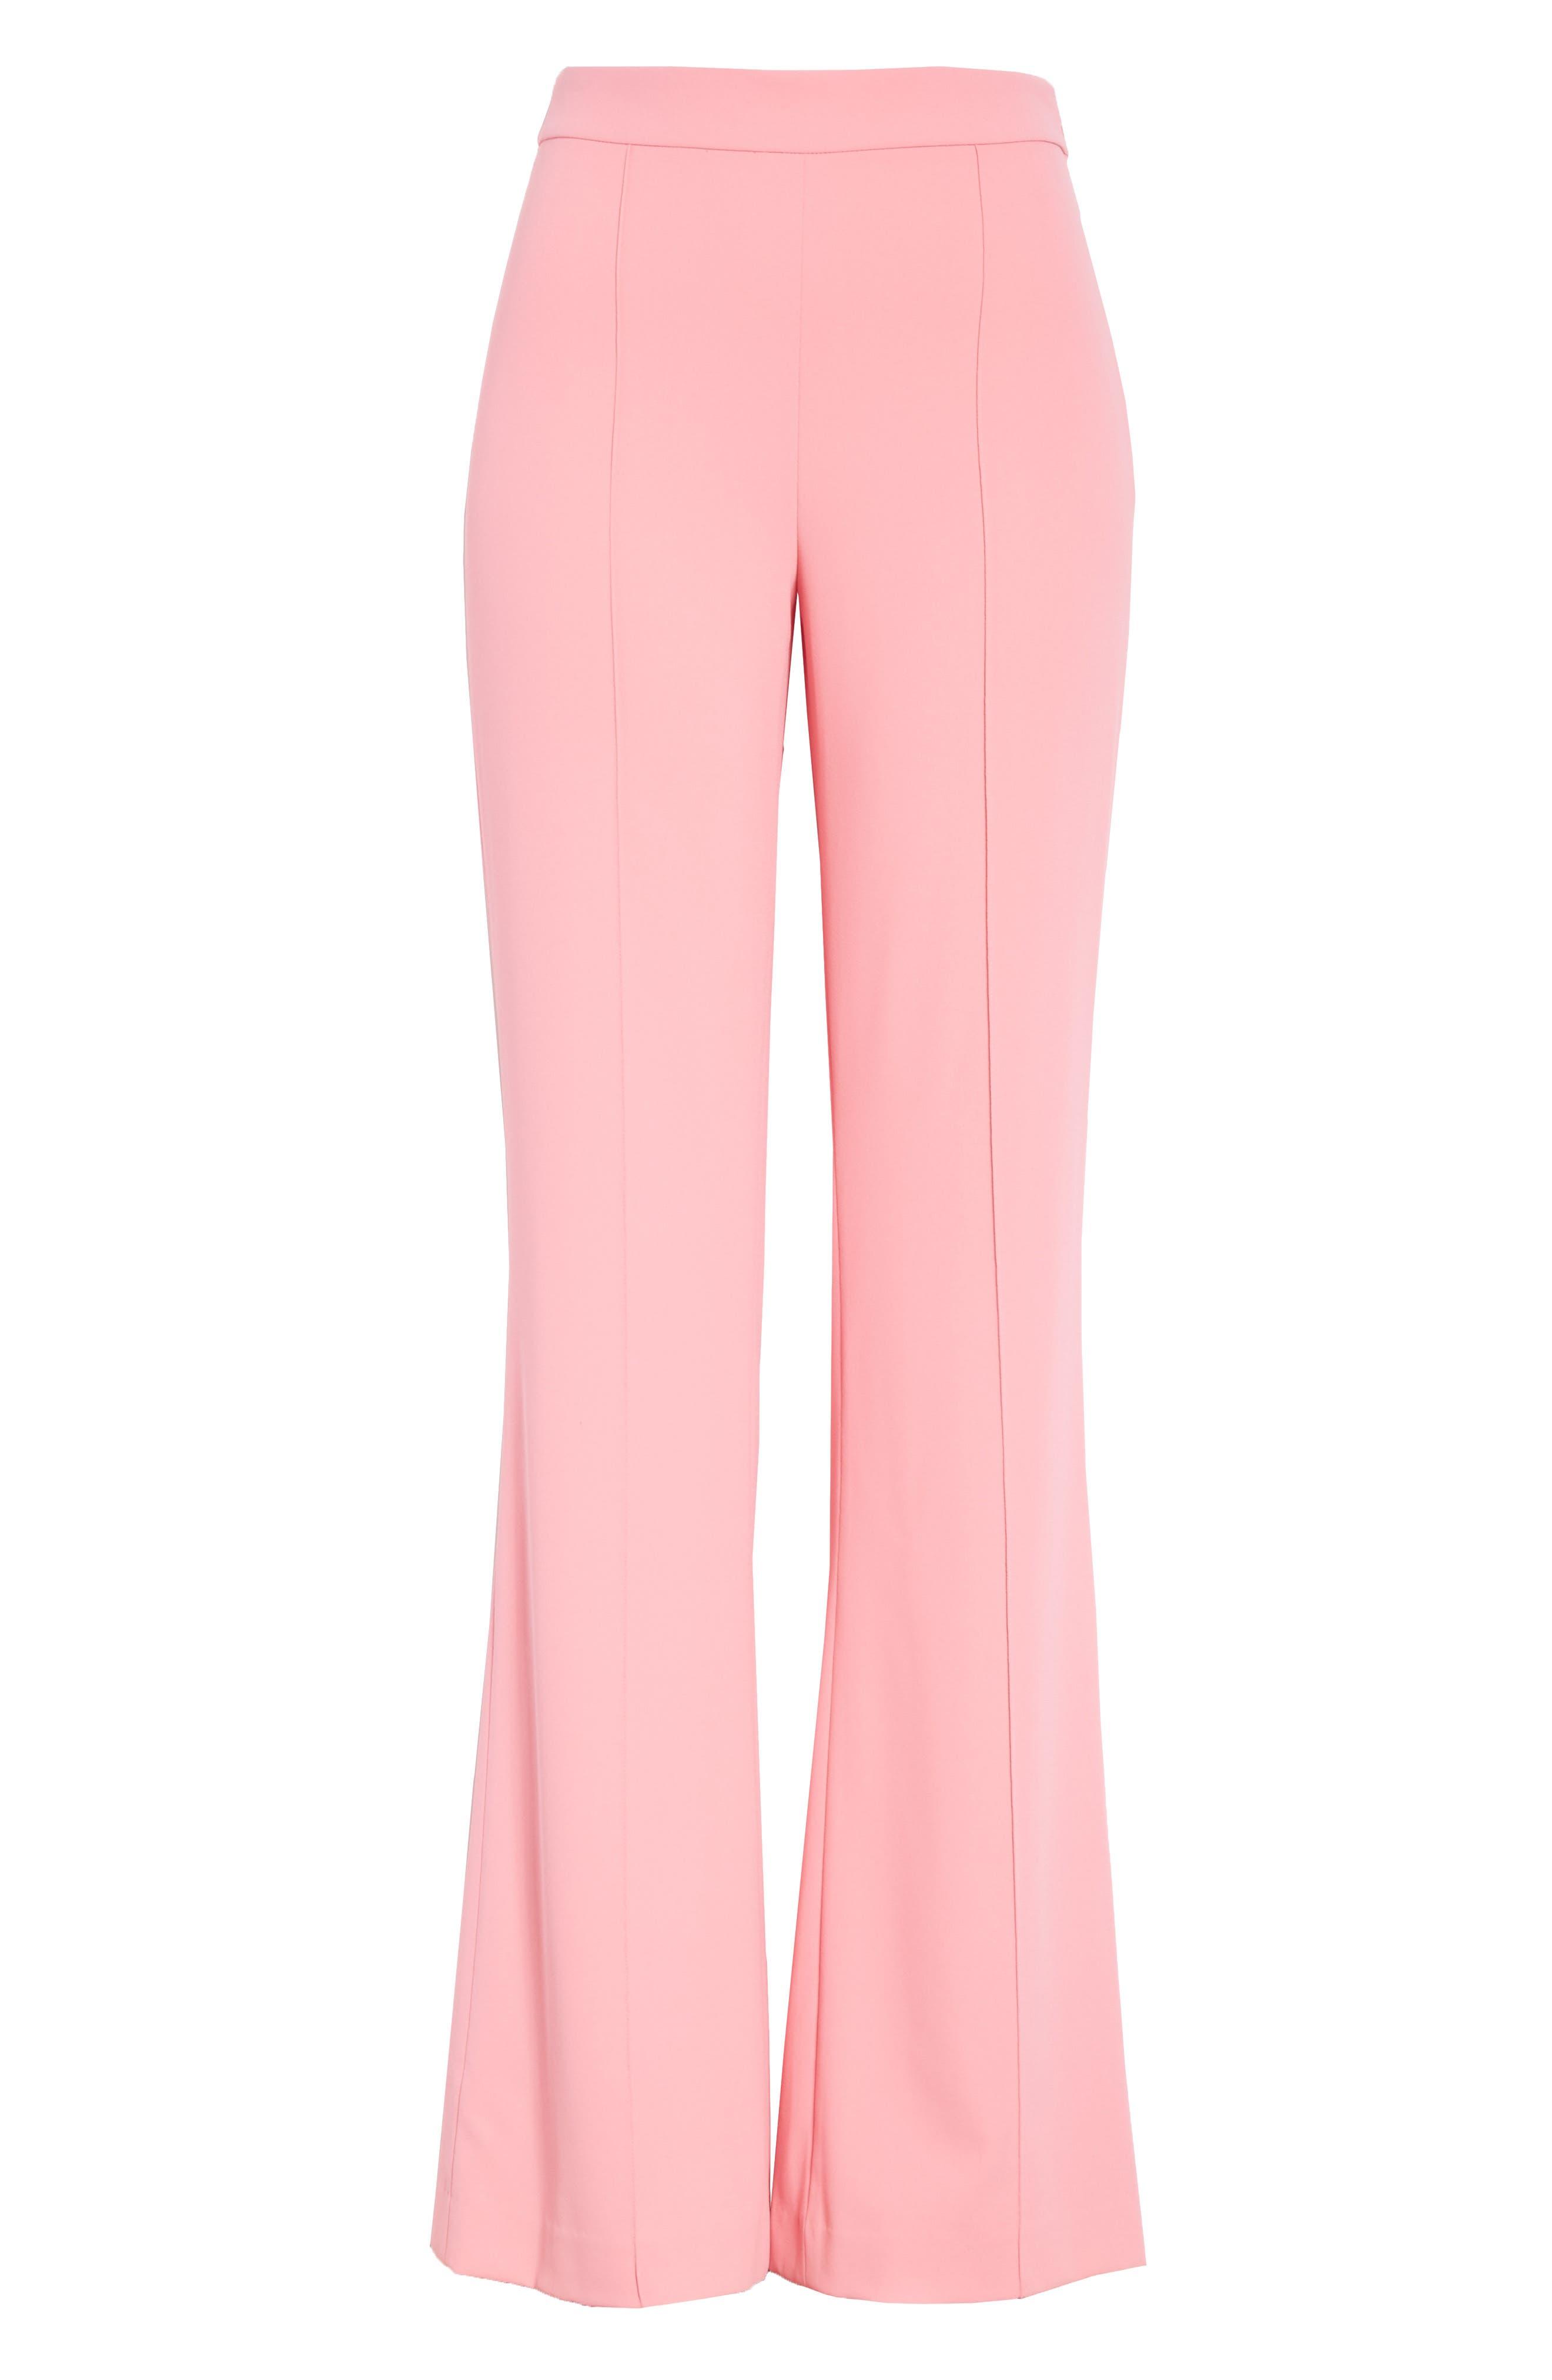 Jalisa High Waist Flare Pants,                             Alternate thumbnail 6, color,                             Bubblegum